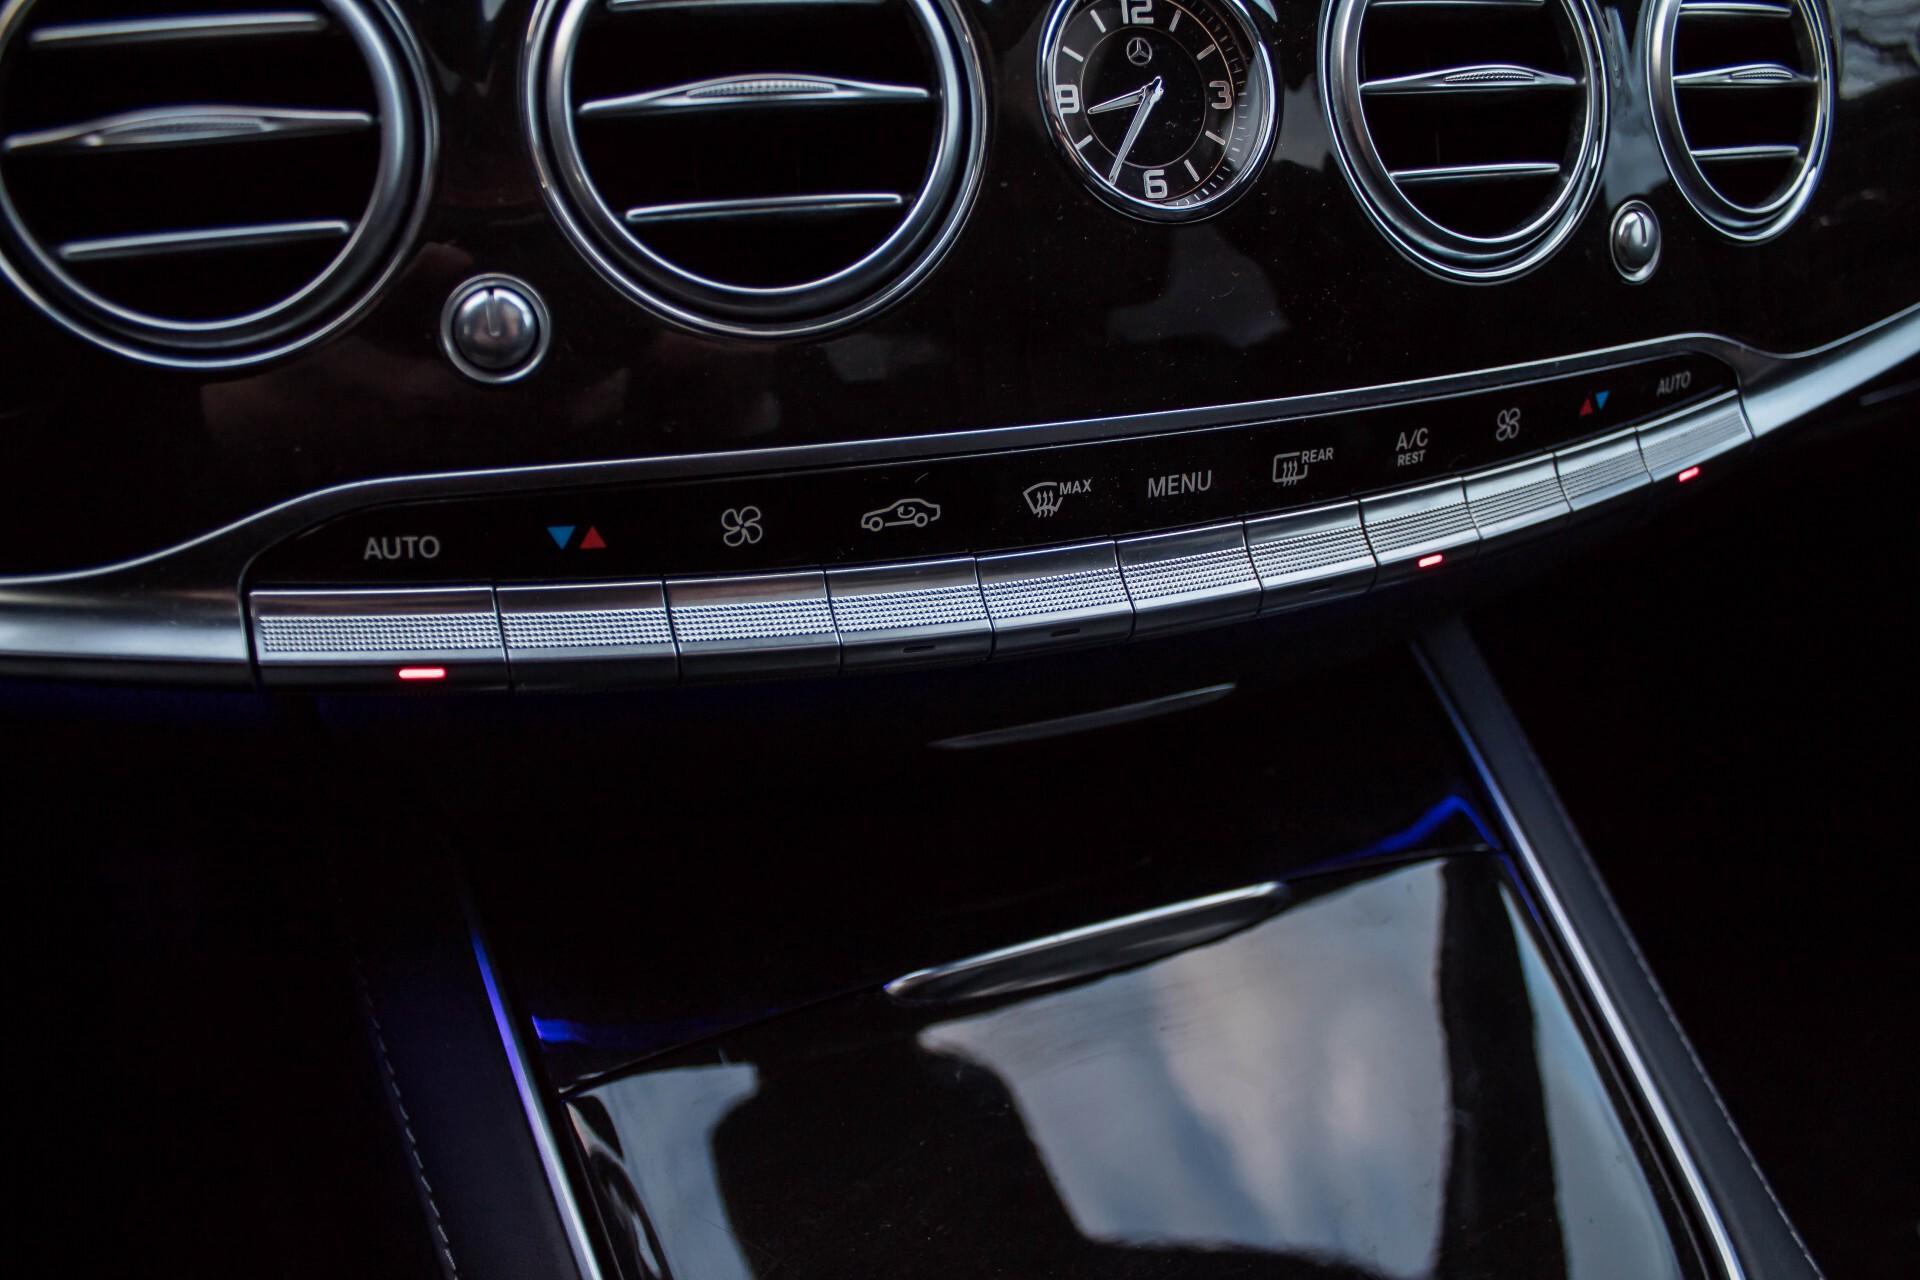 Mercedes-Benz S-Klasse 350 BlueTEC 63 AMG Panorama/Distronic/Keyless/Massage/Burmester Aut7 Foto 22